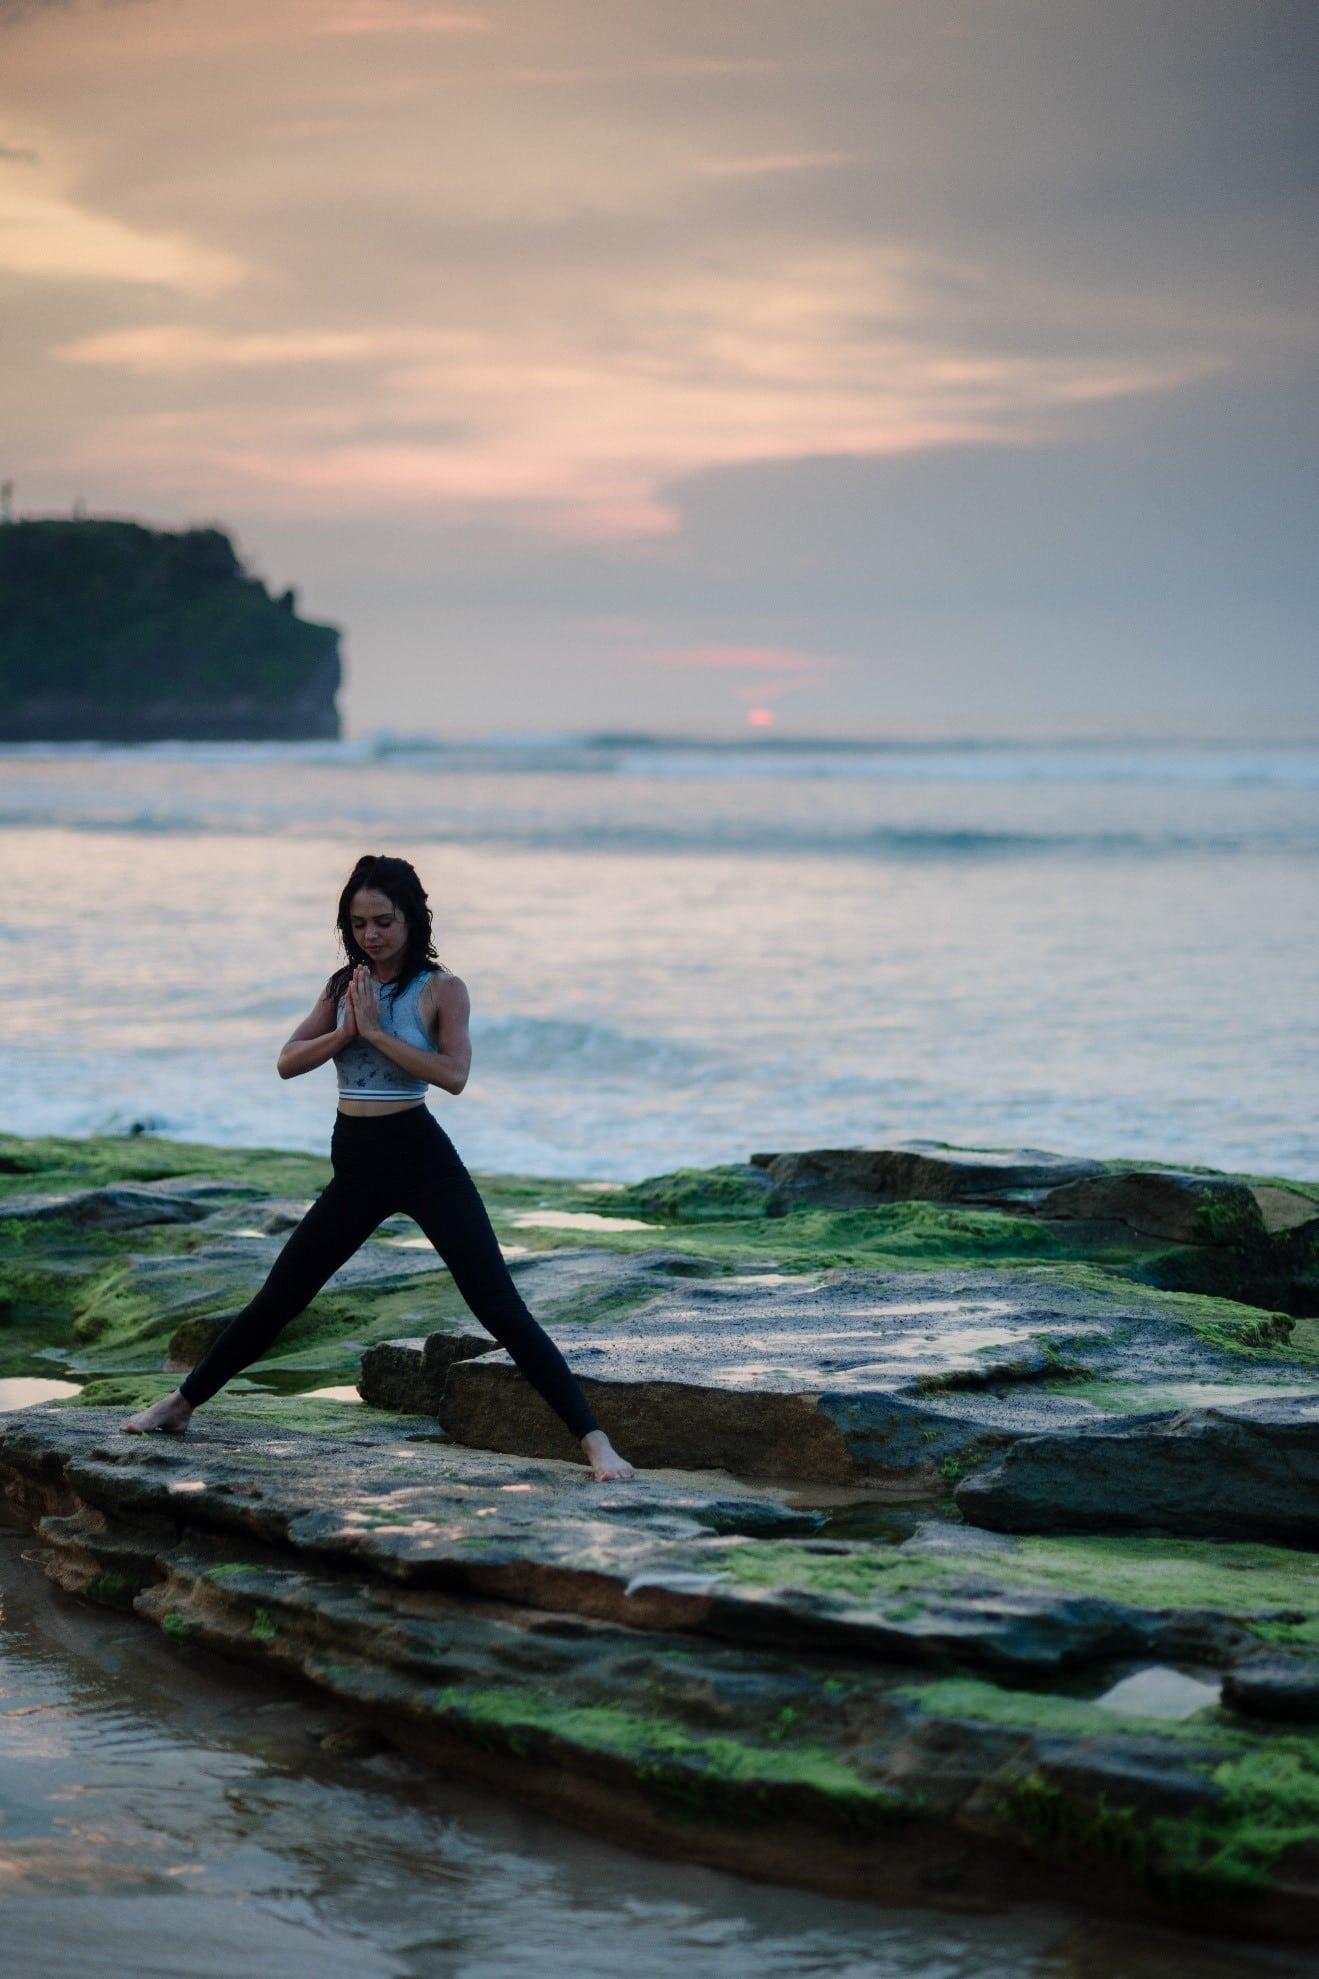 Breathing exercises for full advantage of ocean air